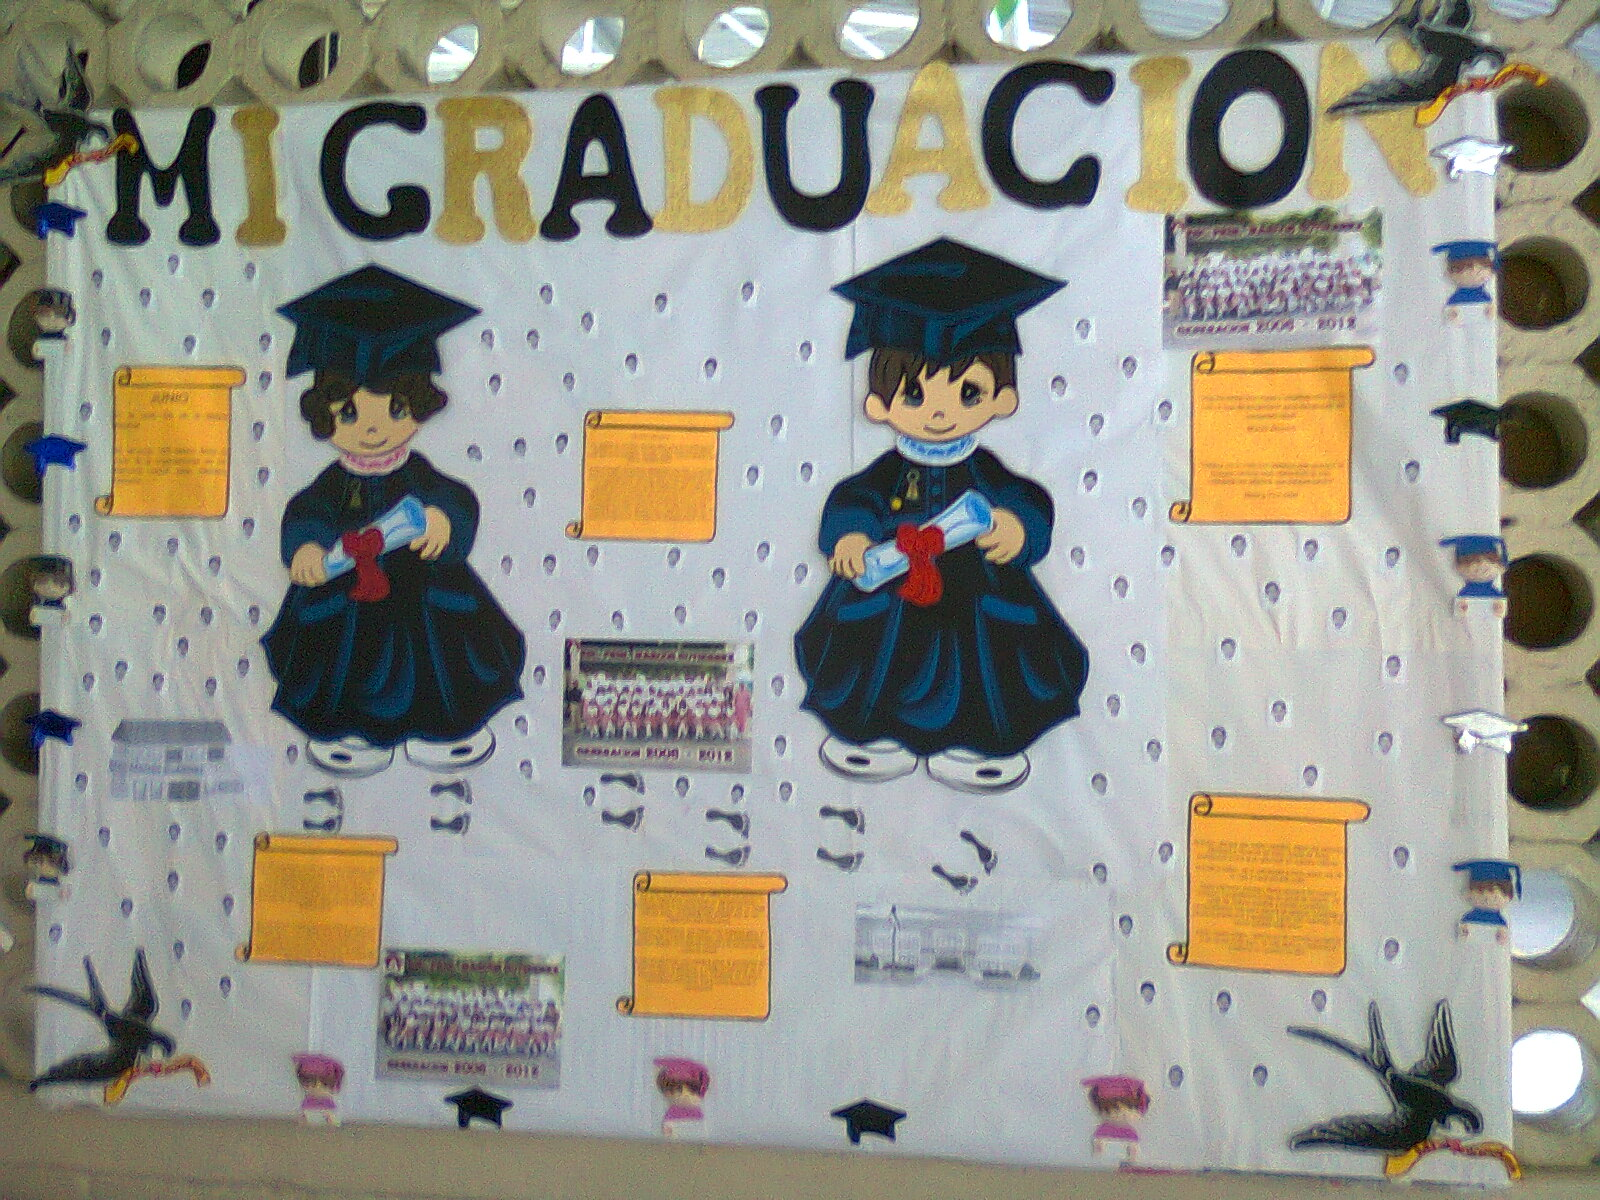 Periodico mural escolar mes de julio peru periodico for El periodico mural